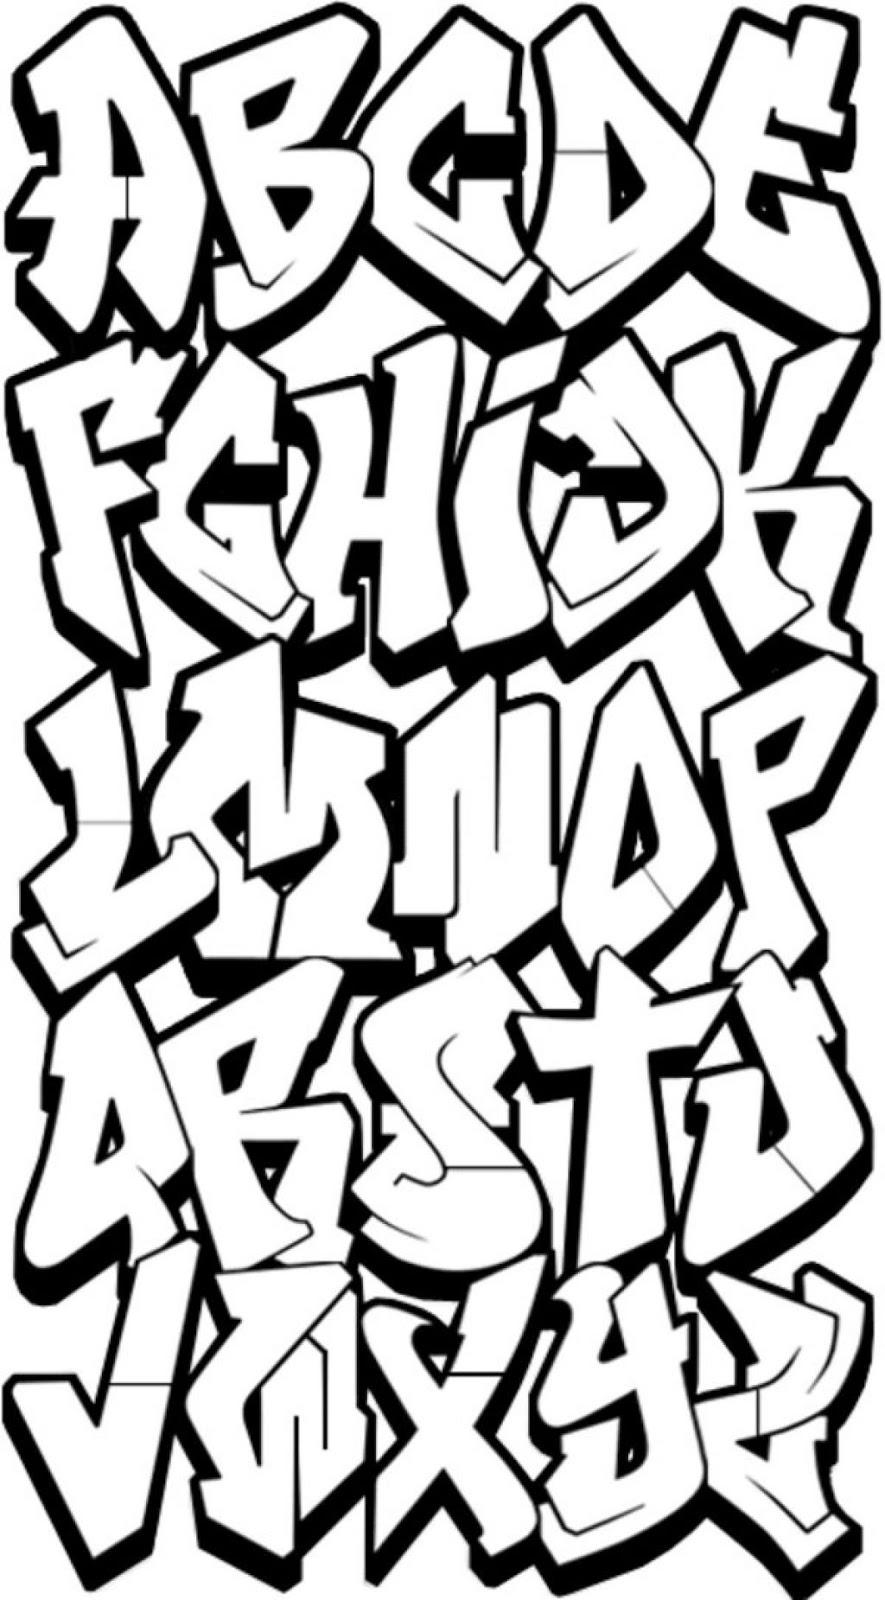 Easy Graffiti Art Ideas